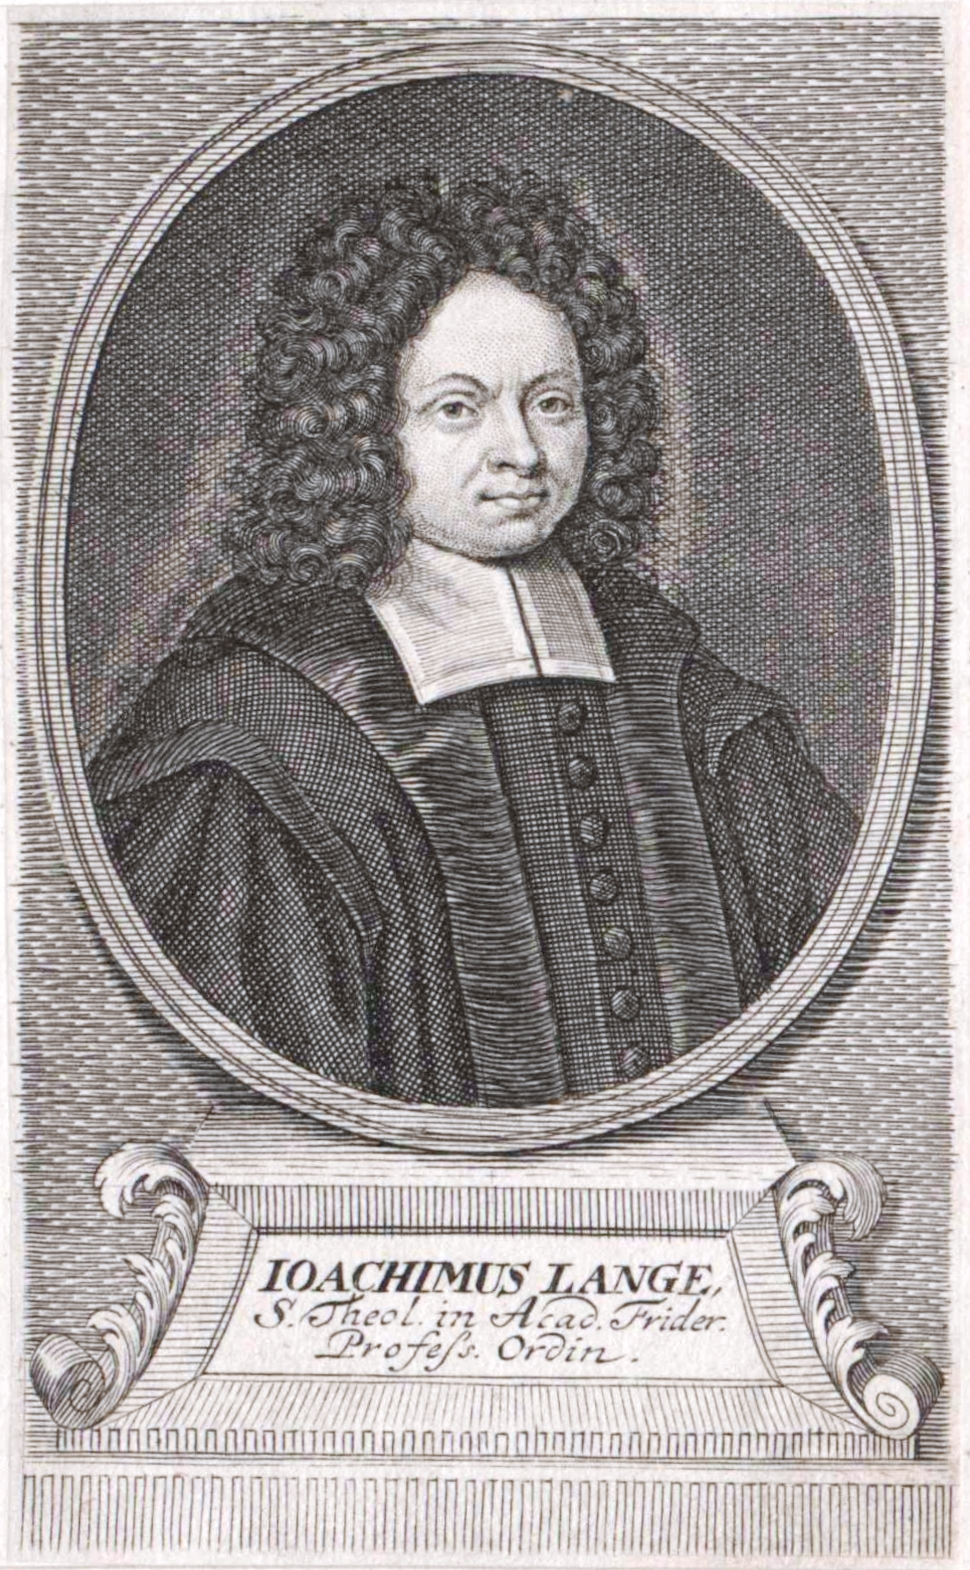 Johann Joachim Lange